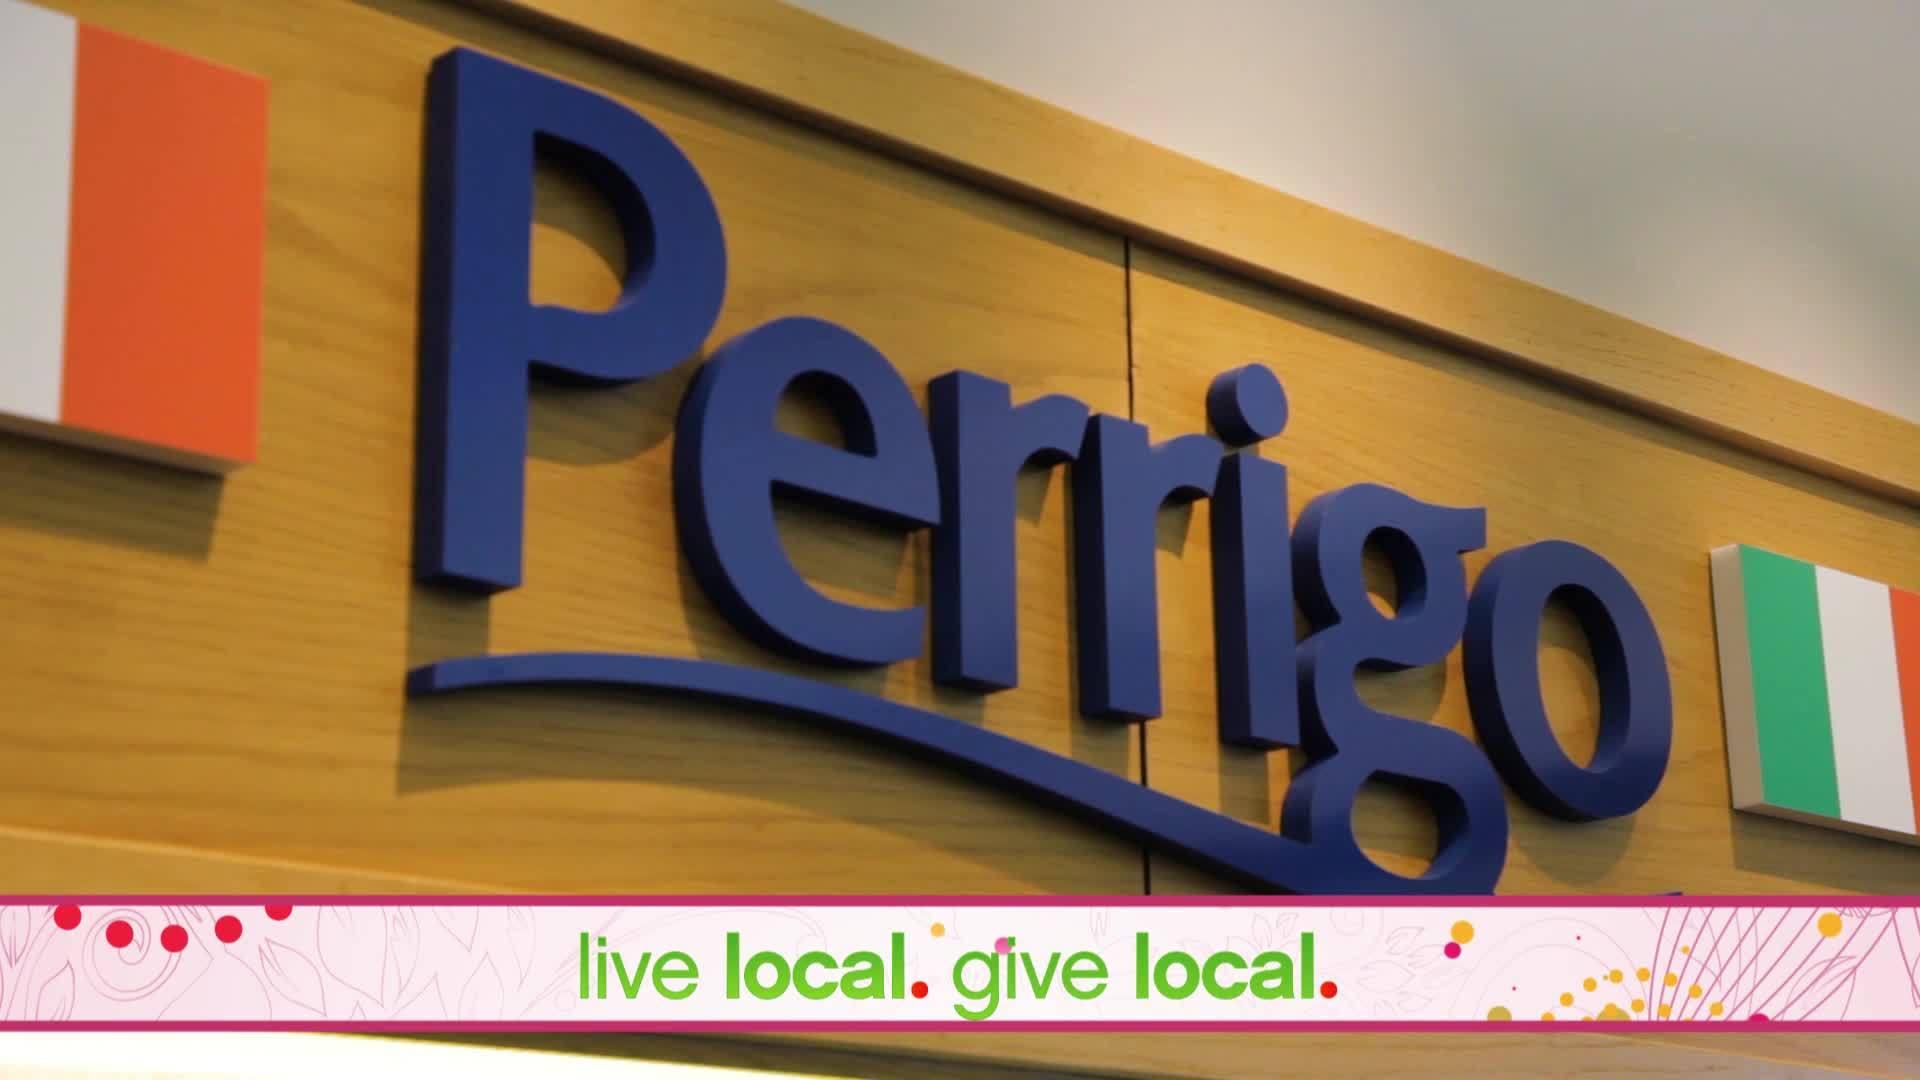 Perrigo_LIVE_LOCAL_GIVE_LOCAL_4_20190425140817